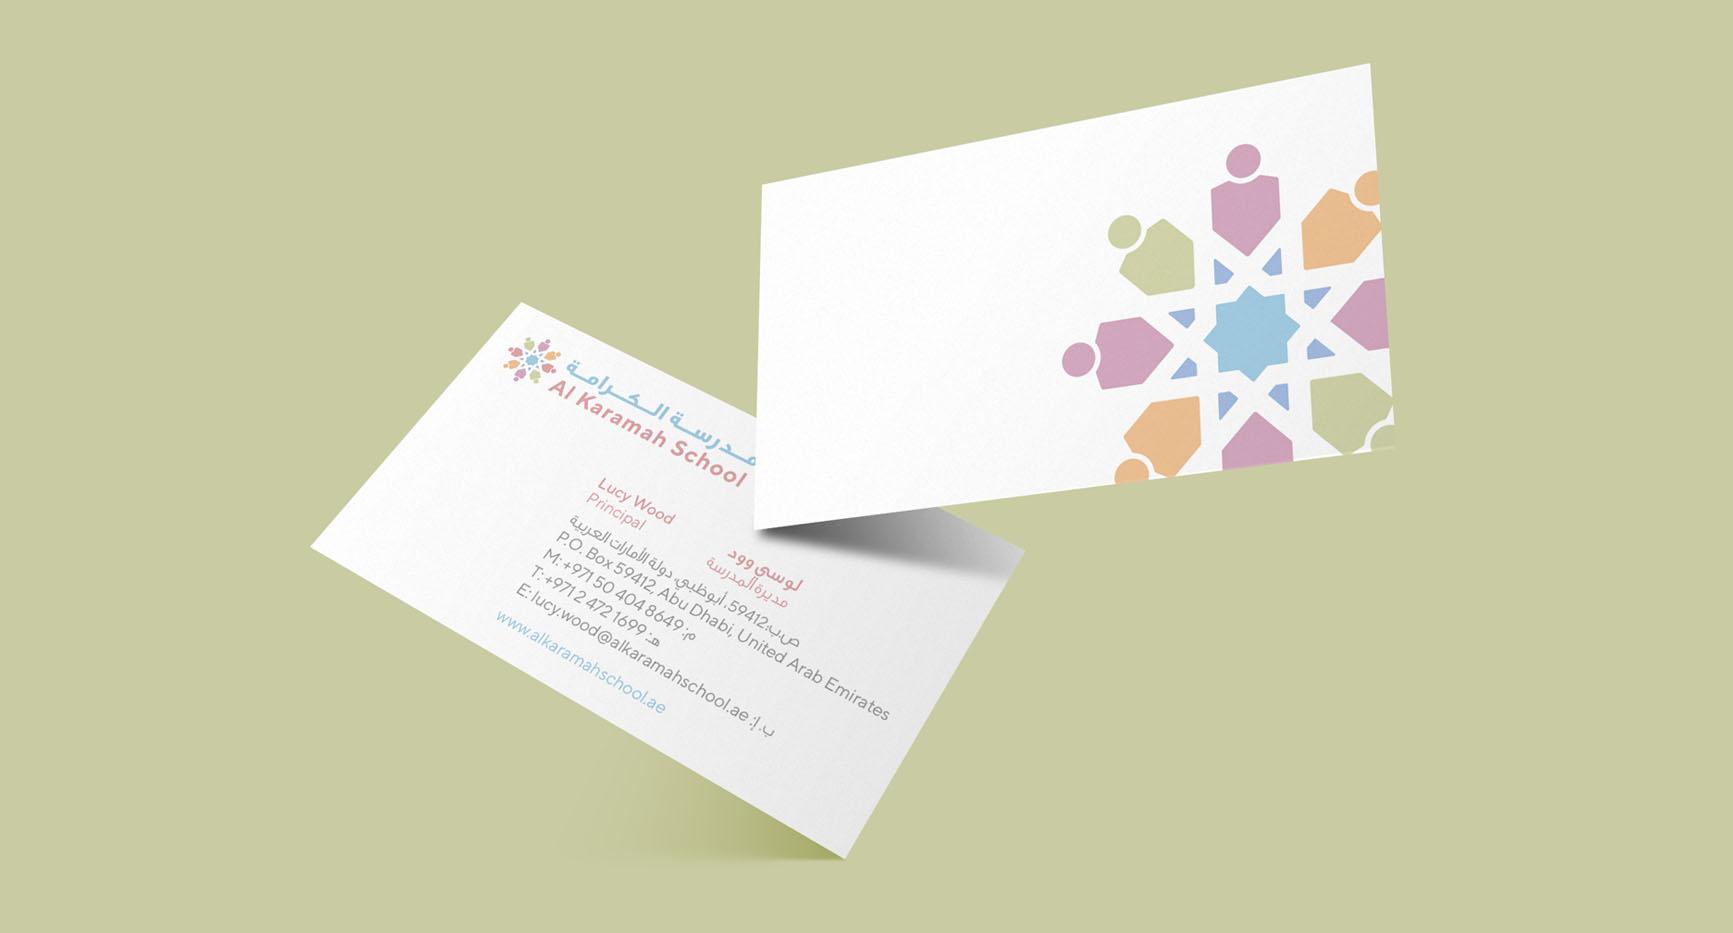 al-karamah-school-business-card-design